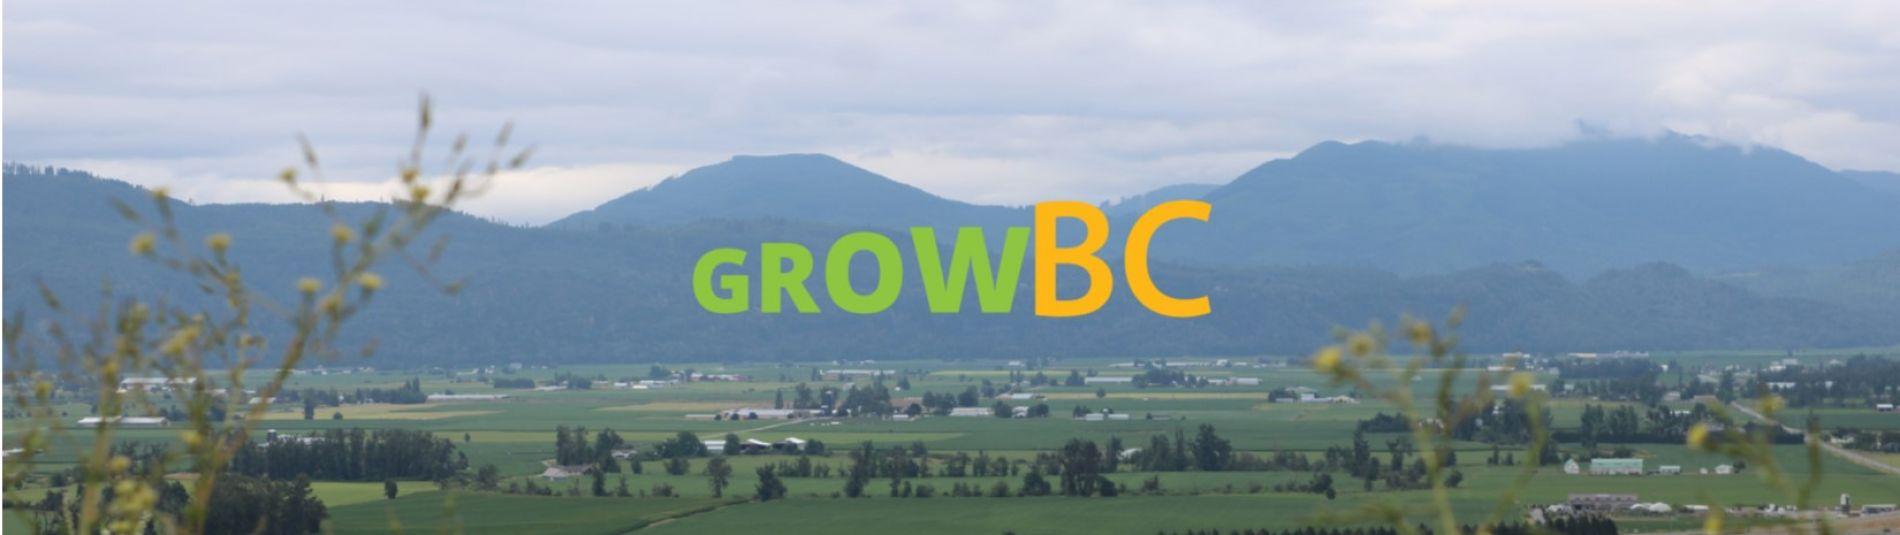 Grow BC